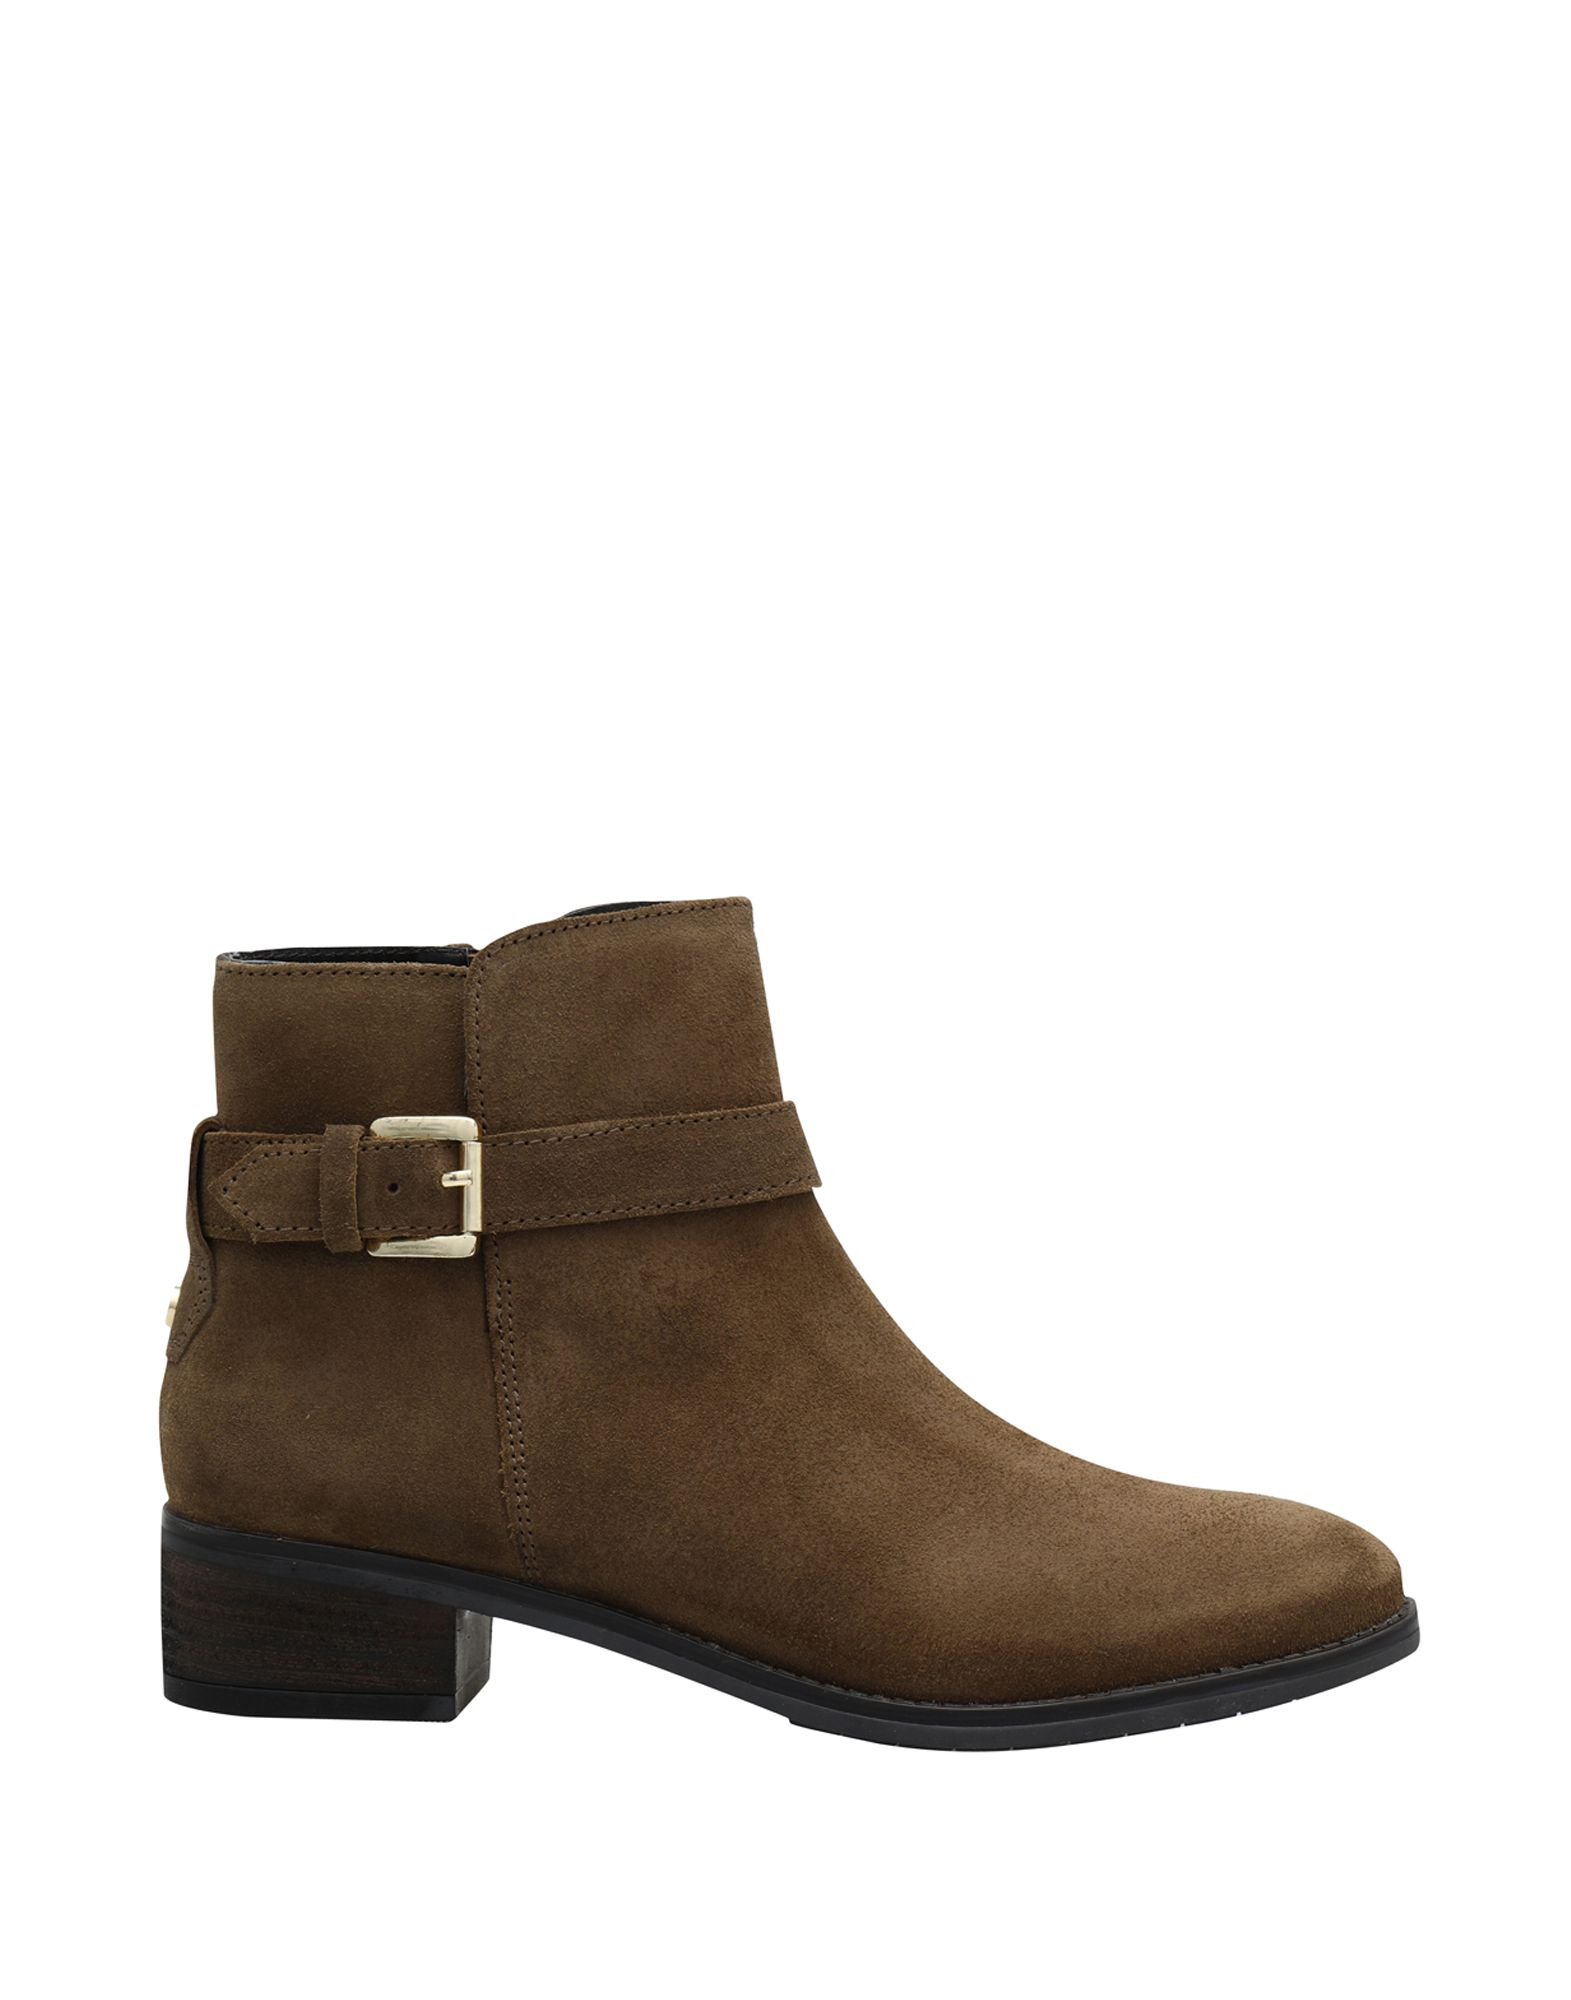 Dune London Pheobie - Ankle Boot - Boots Women Dune London Ankle Boots - online on  Australia - 11555447ED 46f788